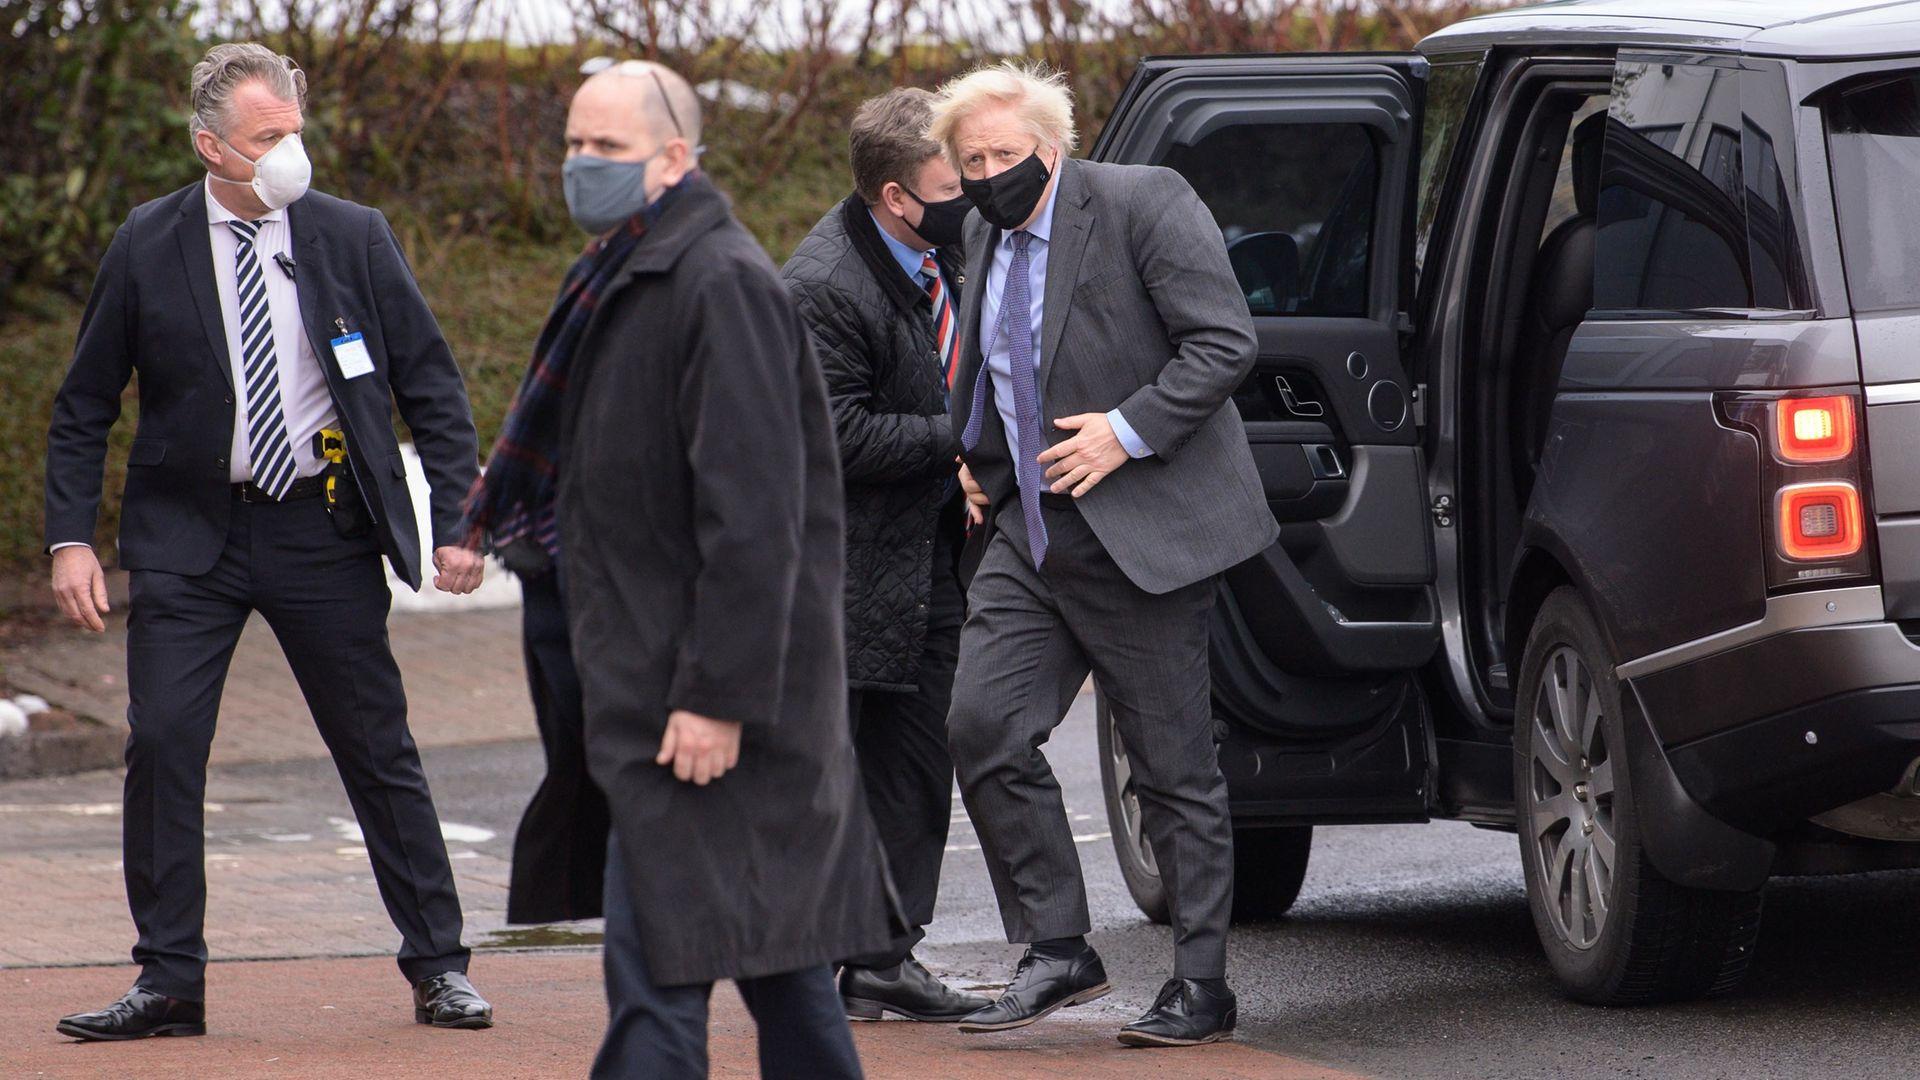 Prime Minister Boris Johnson visiting Scotland - Credit: PA